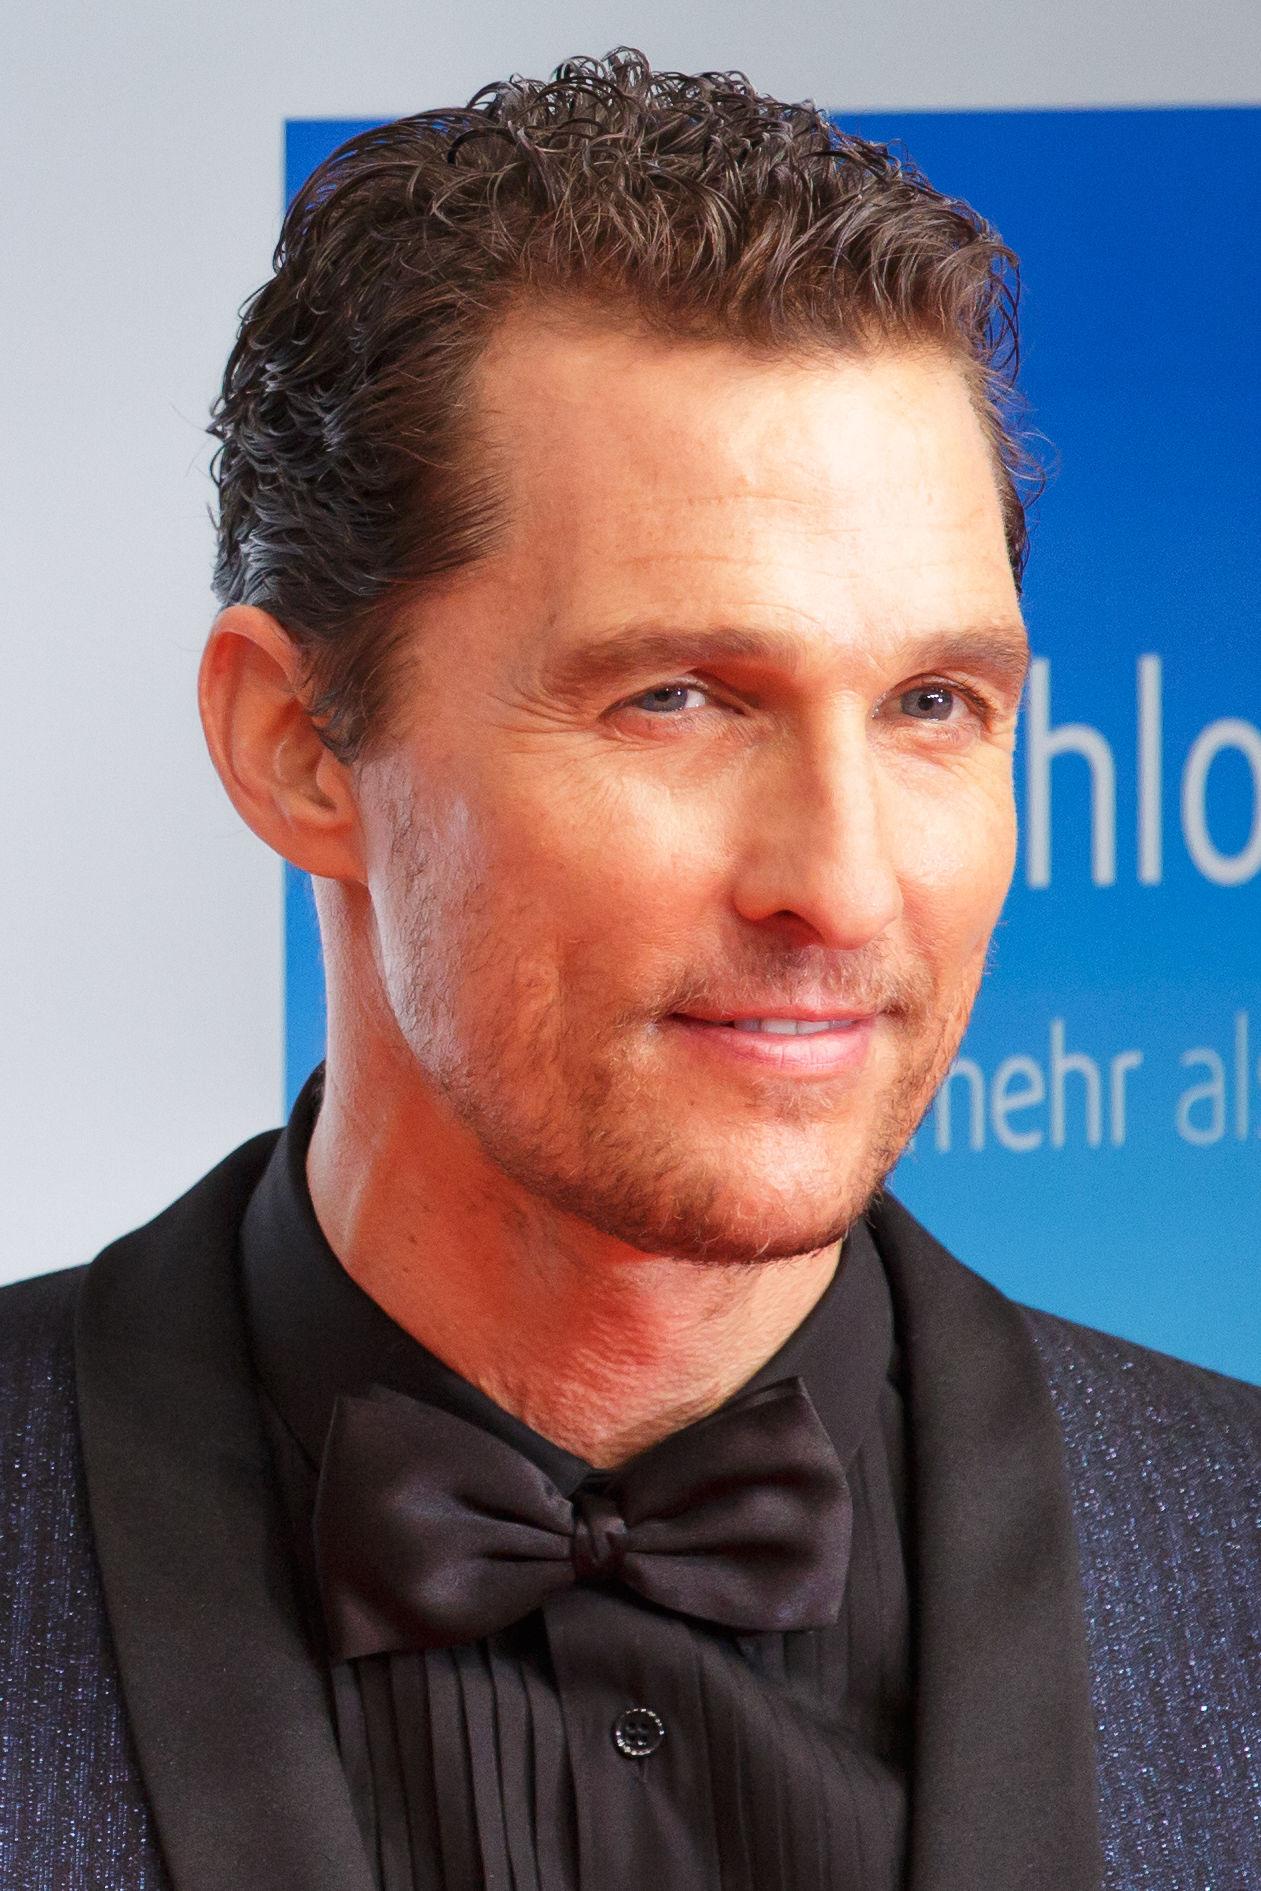 Photo of Matthew McConaughey: American actor